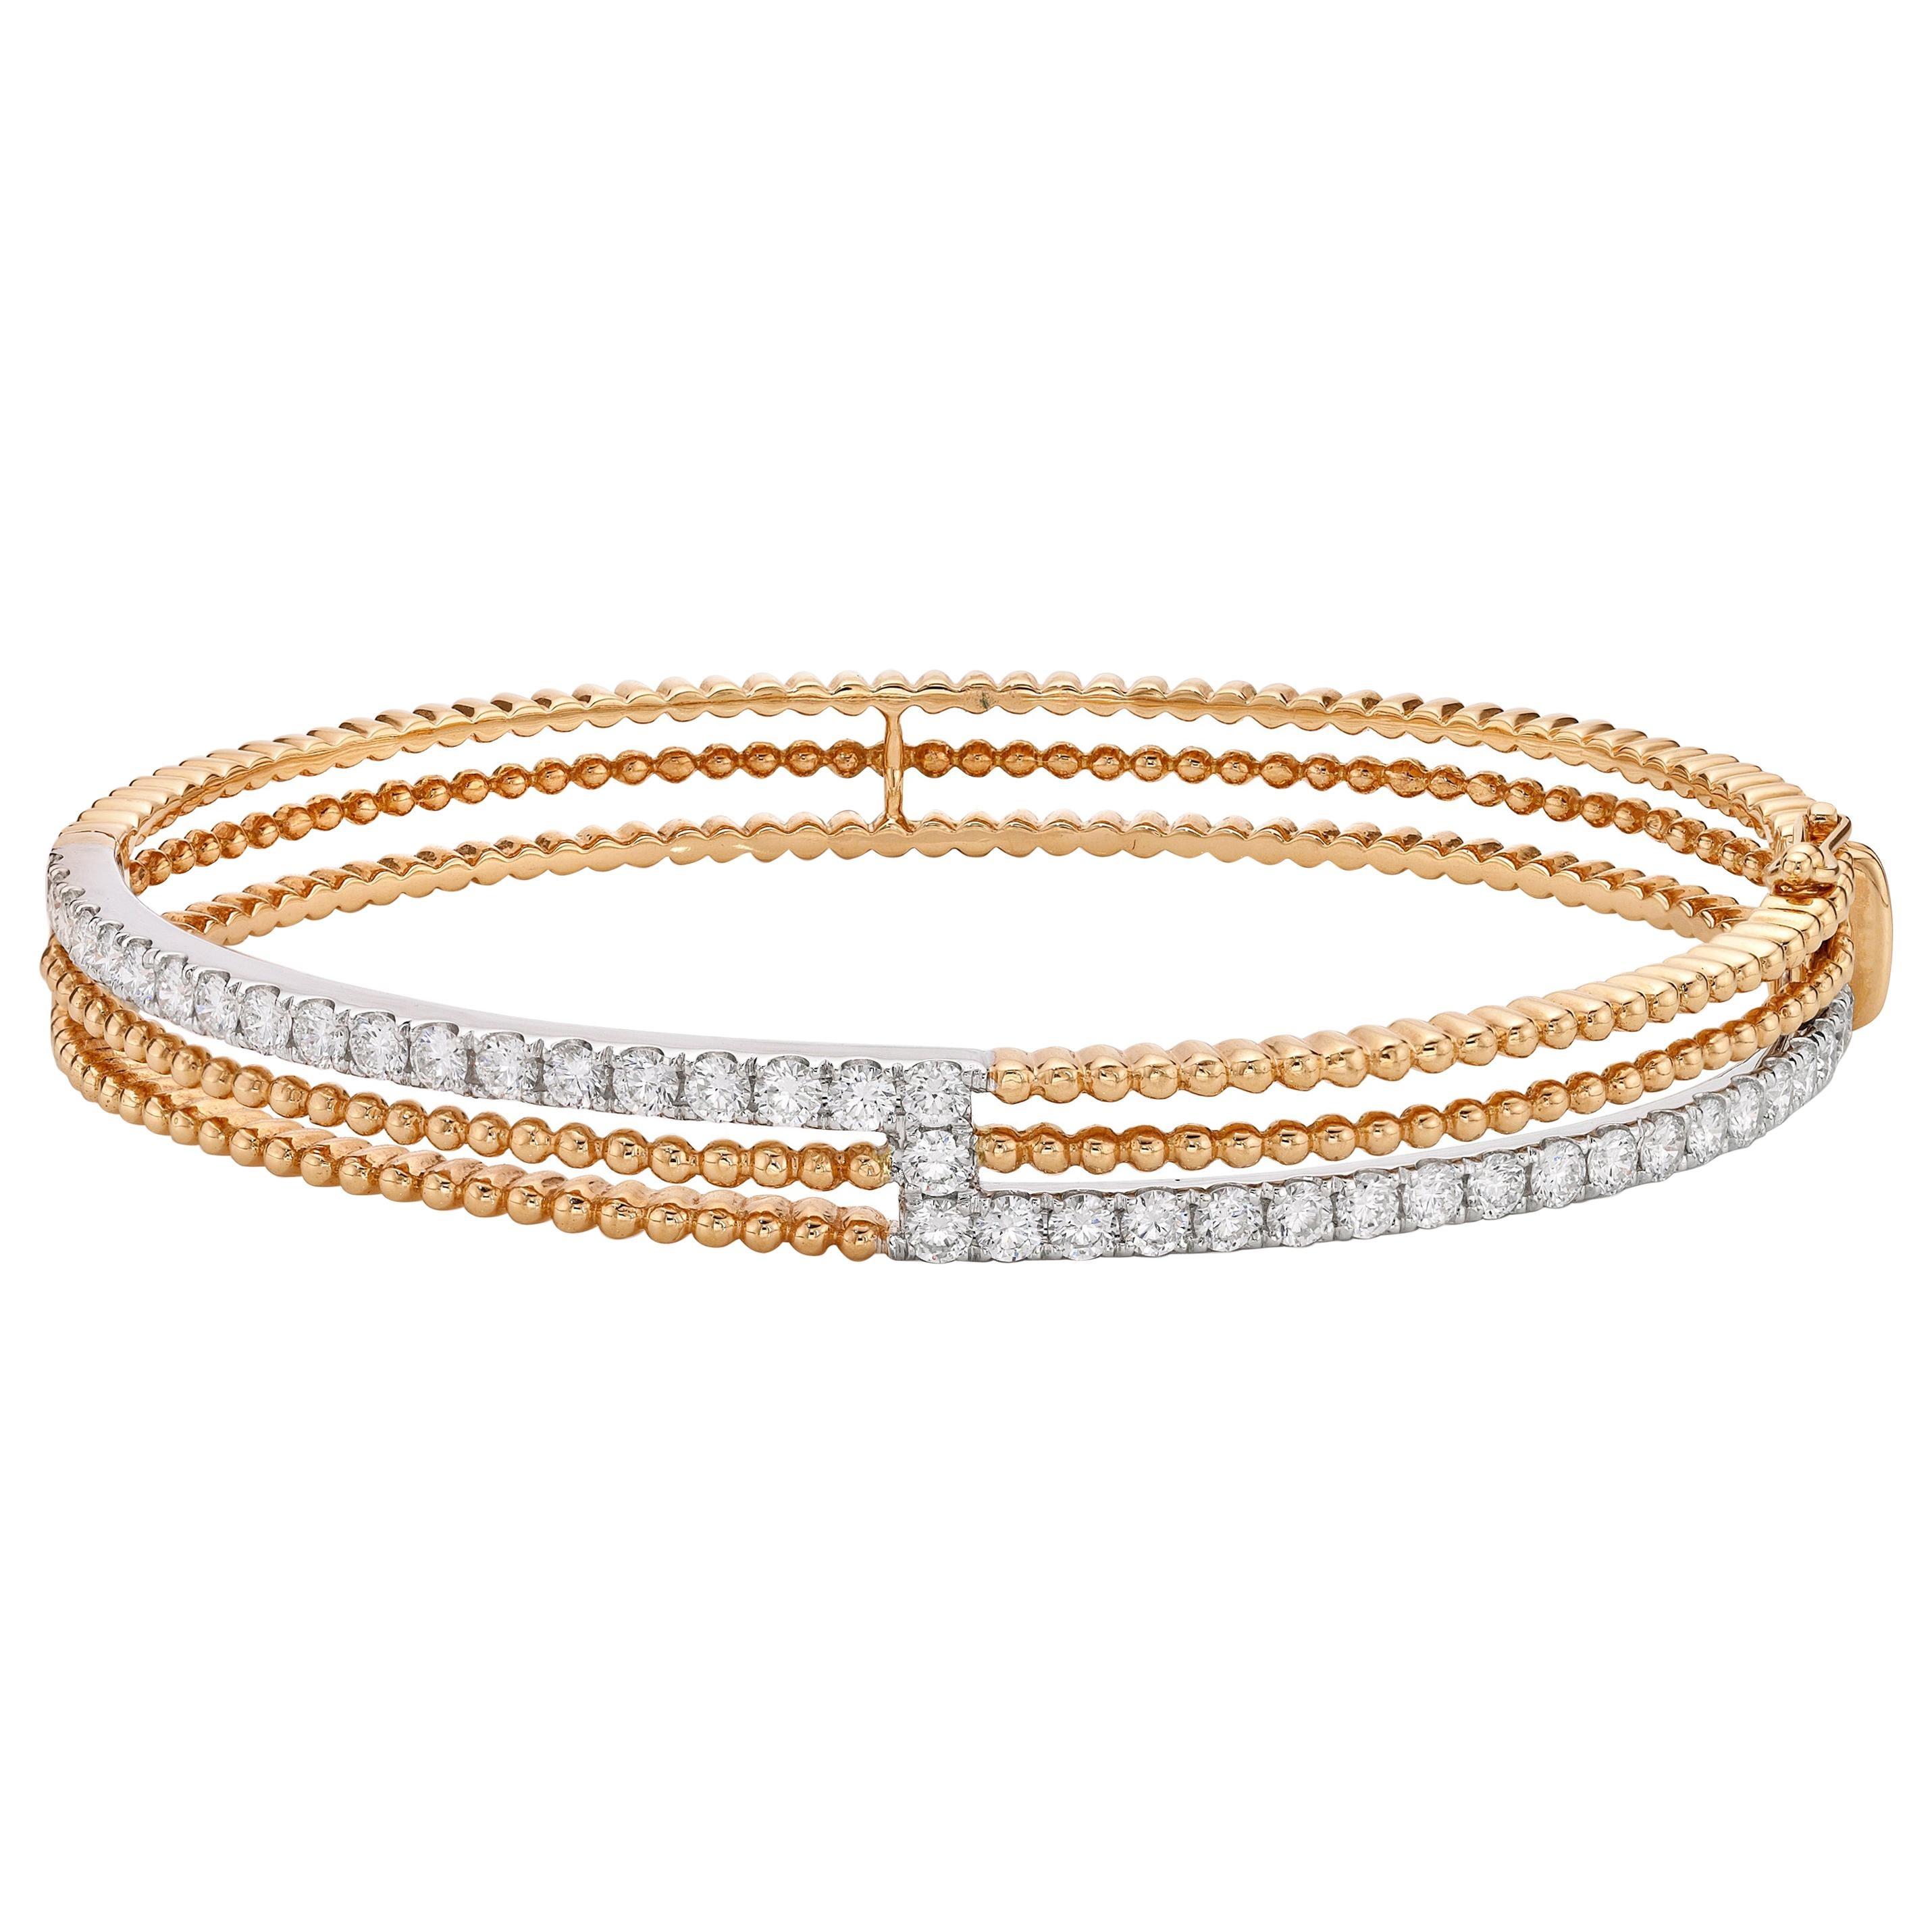 Fancy Three Layered Cuff Bracelet 18 Karat Gold Bangle Bracelet